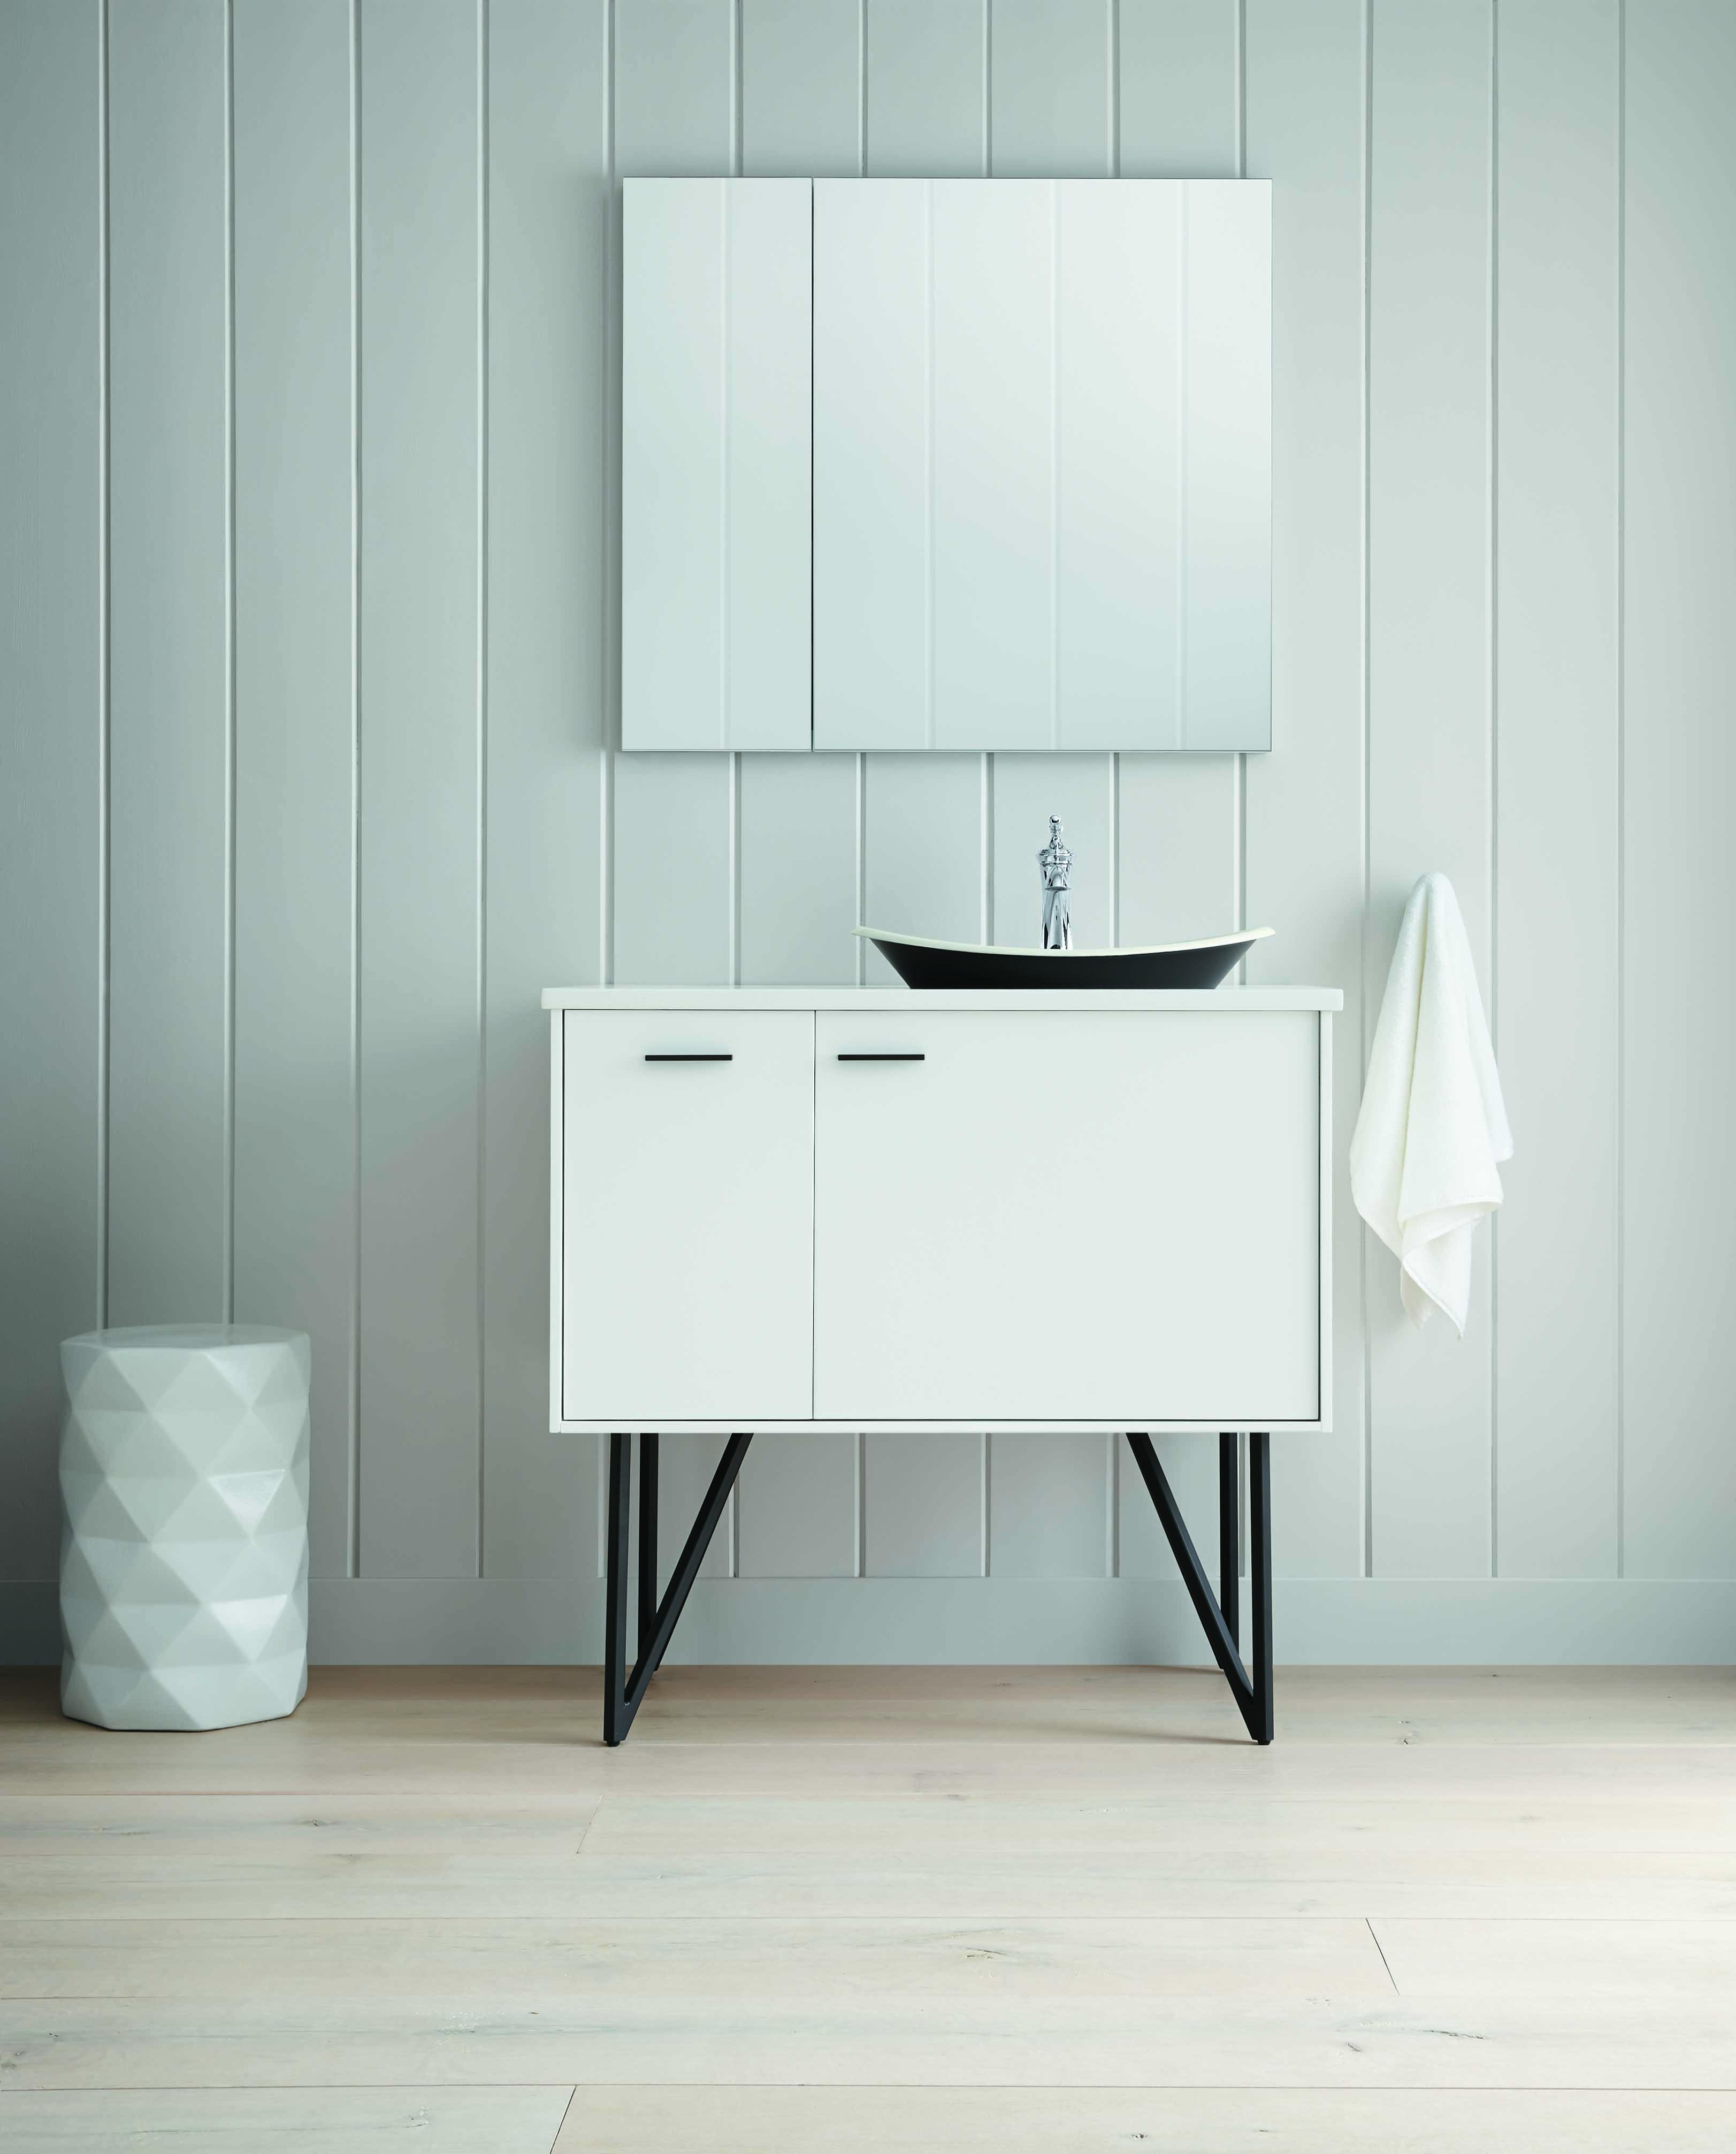 Jacquard® Vanity     Briolette™ Sink     Ornate hardware on this vanity adds a sense of refined elegance to the bathroom's artistic design.